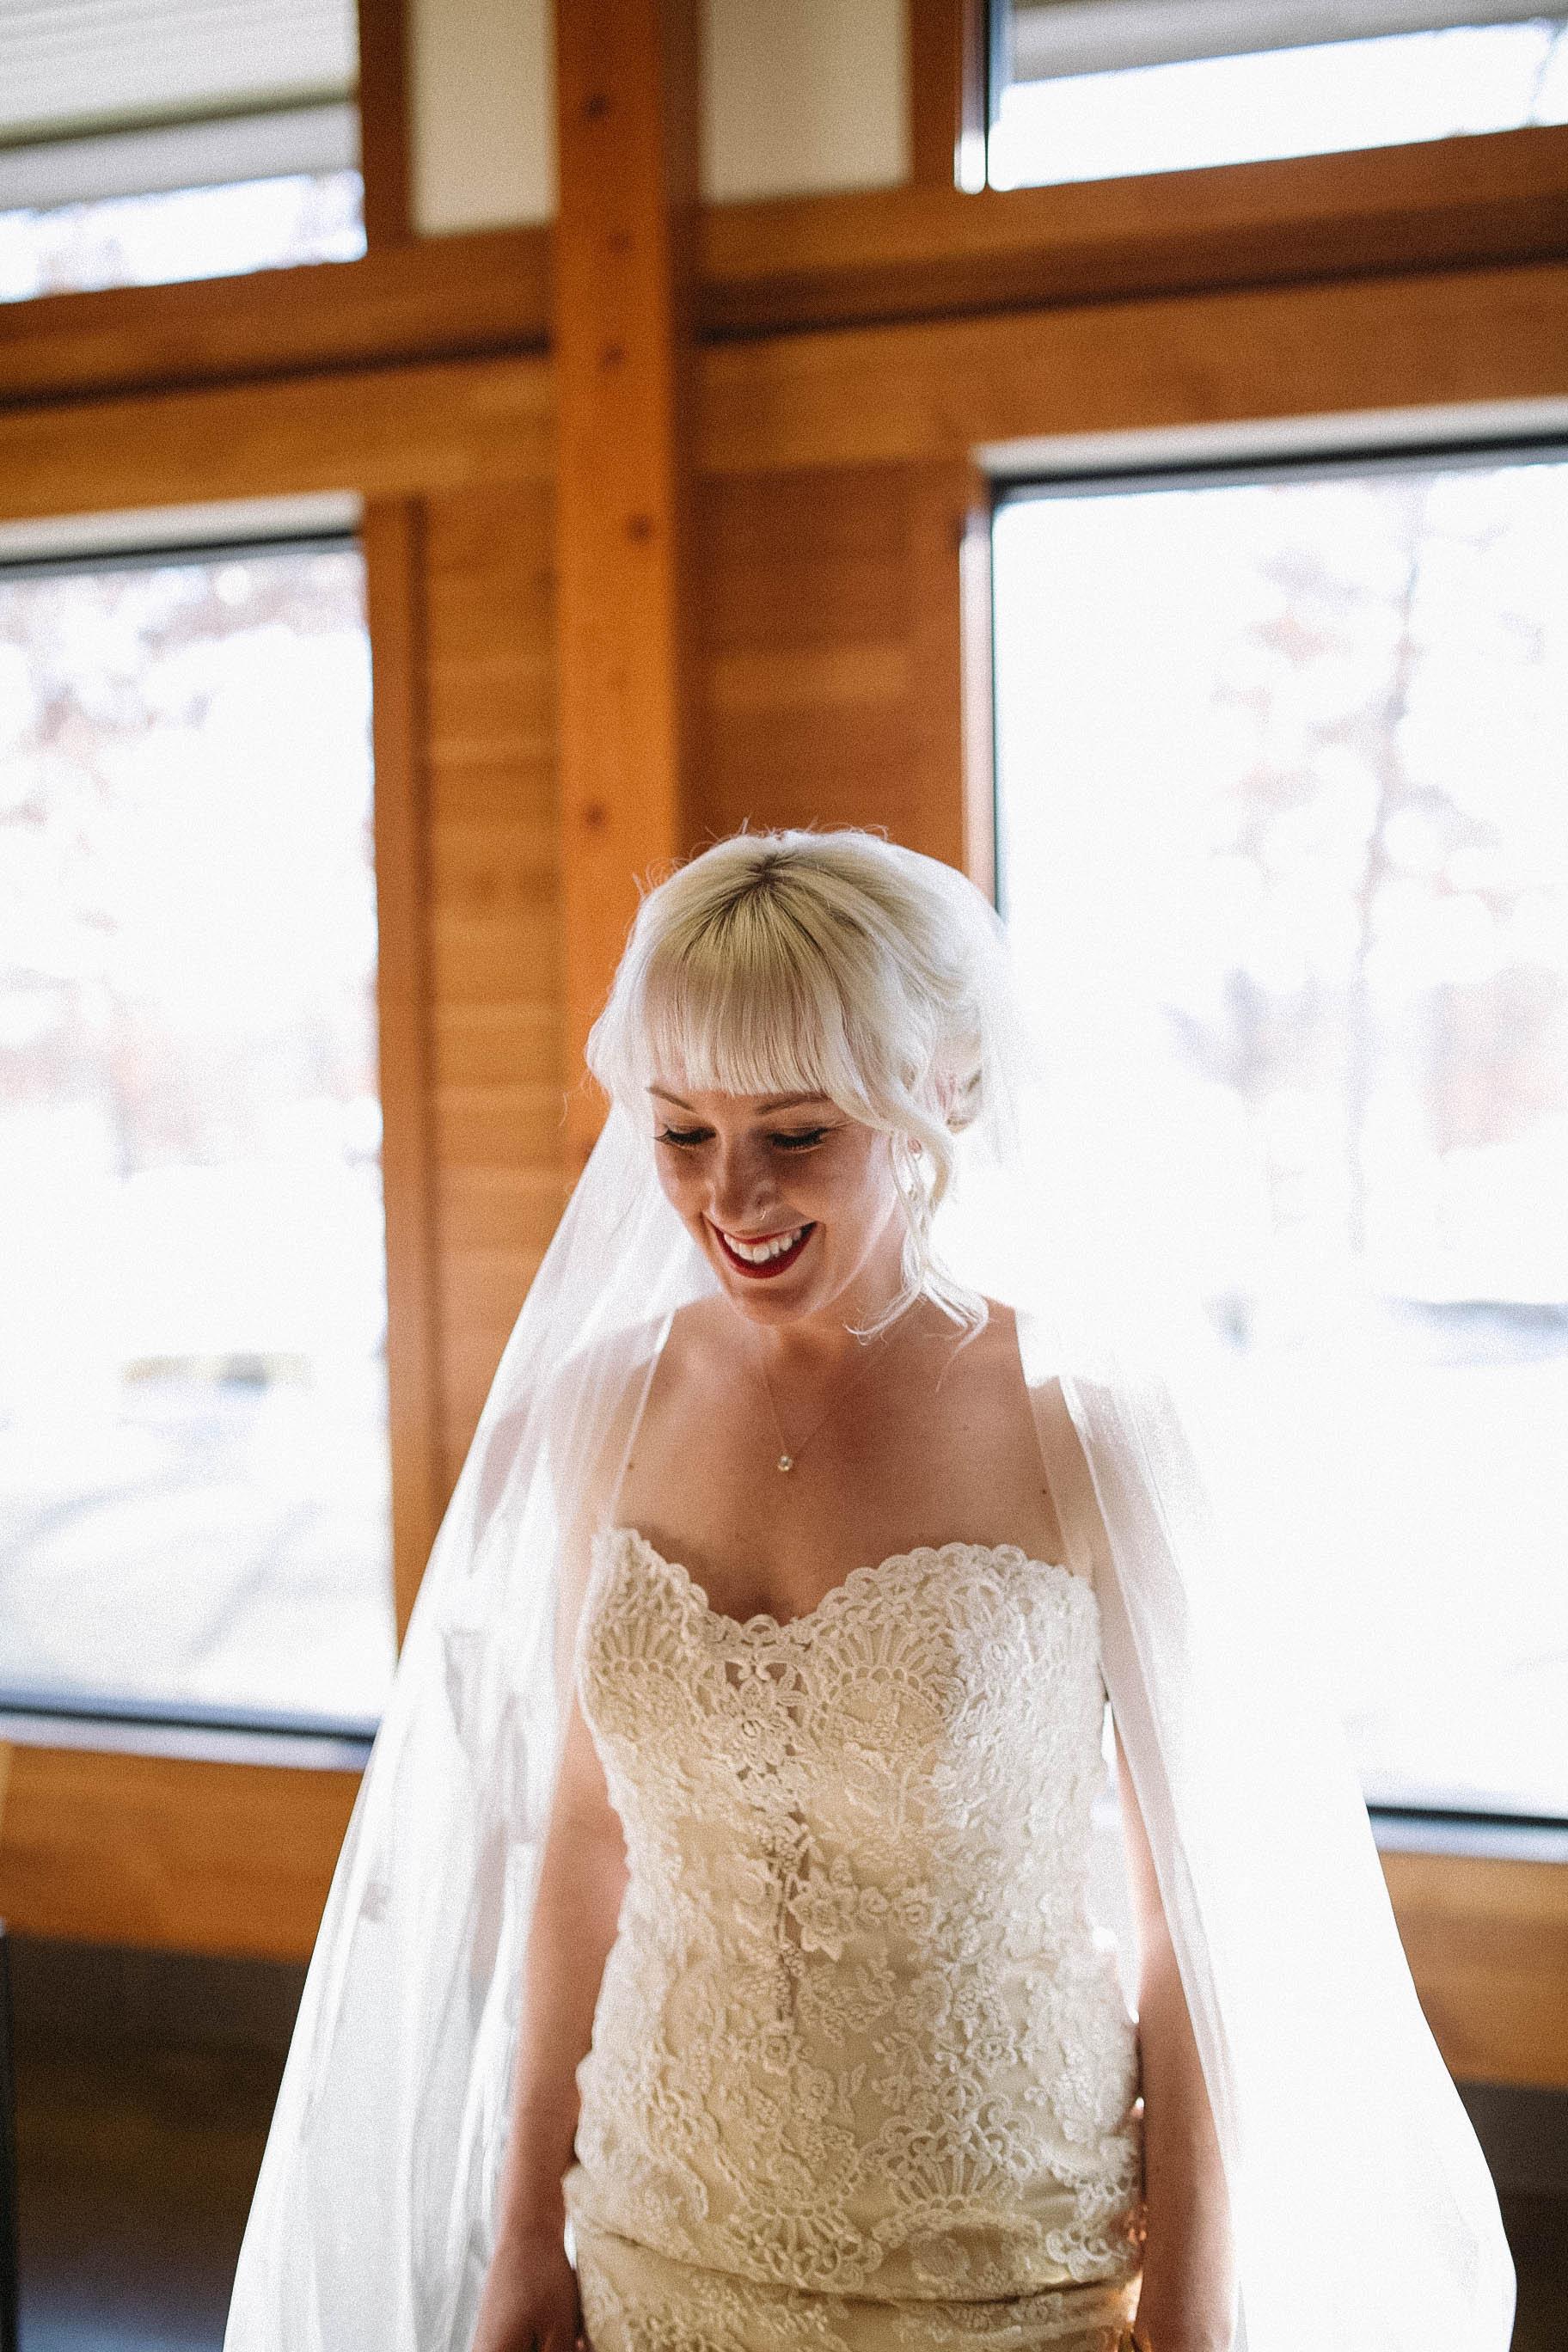 *01 Bride-0027.jpg